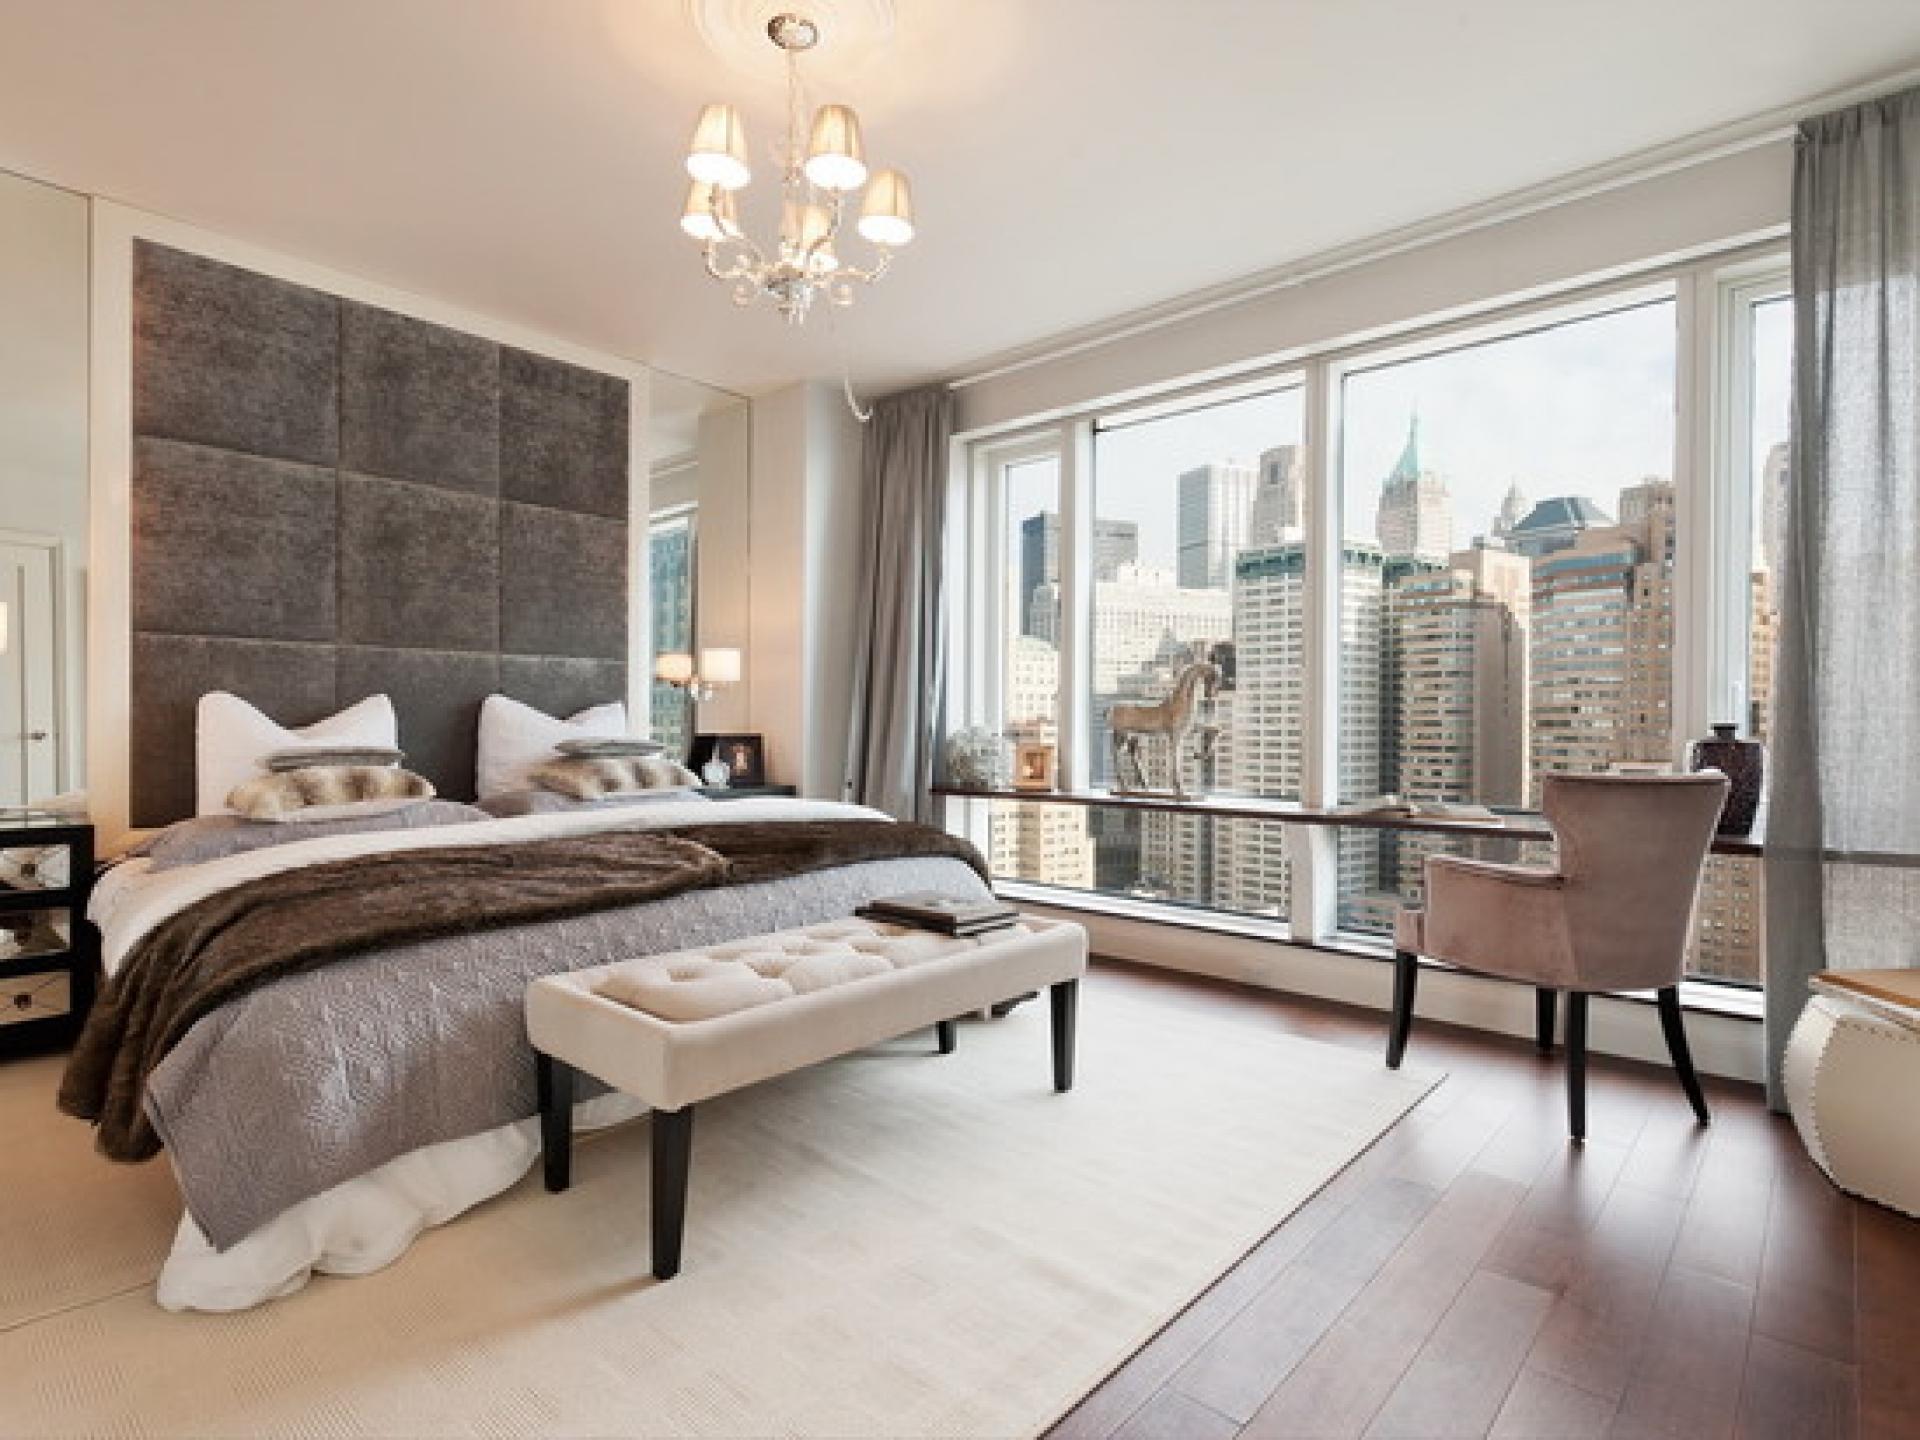 Master Bedroom Ideas That Will Impress